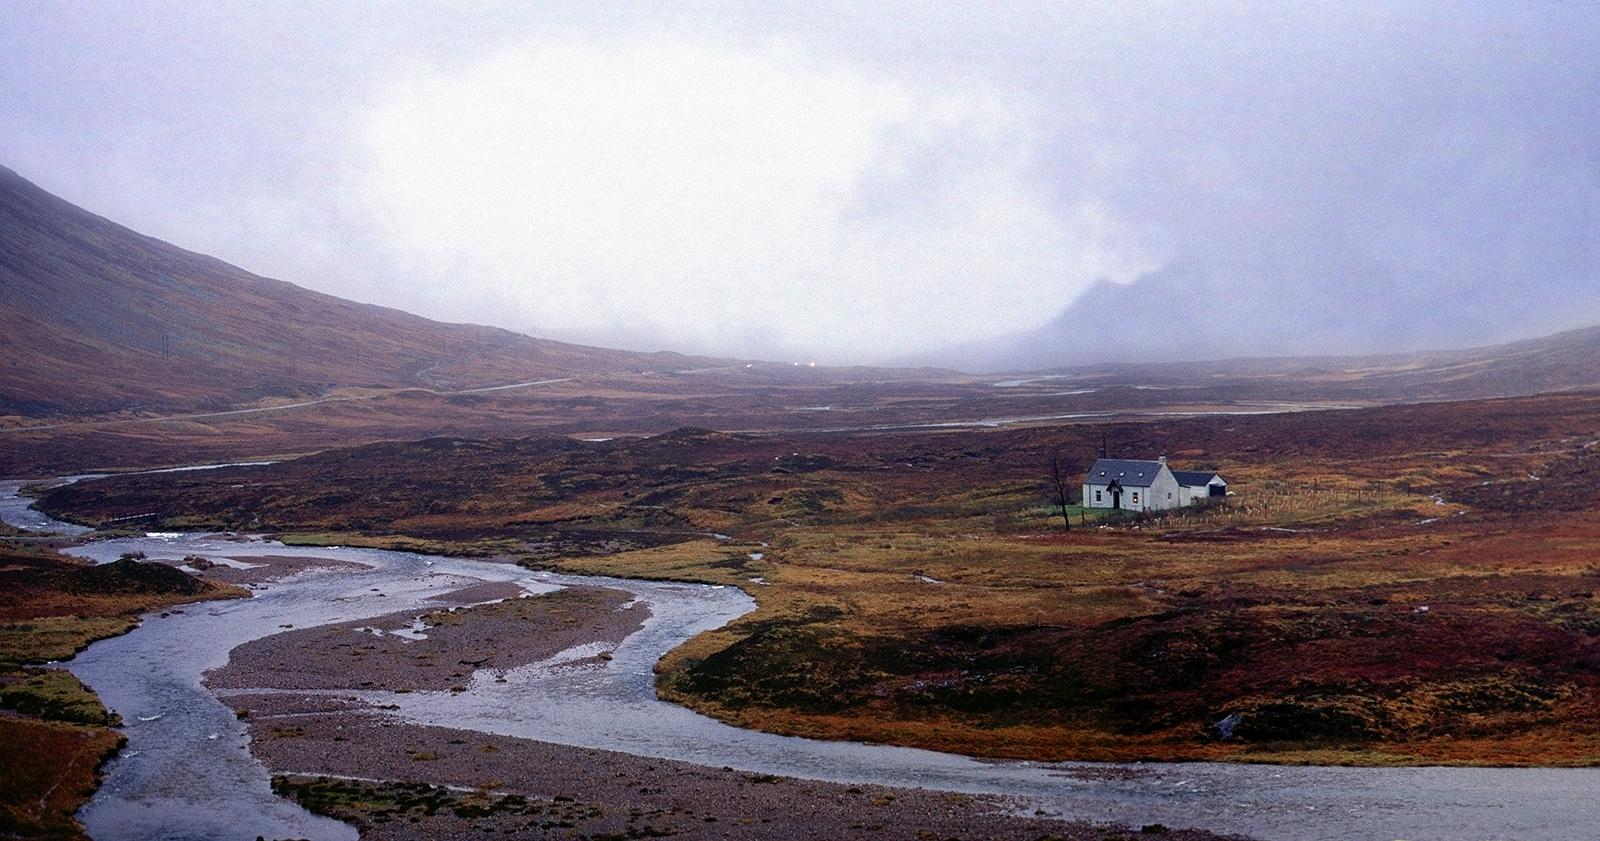 Scotland - Signed limited edition fine art print, colour landscape photography